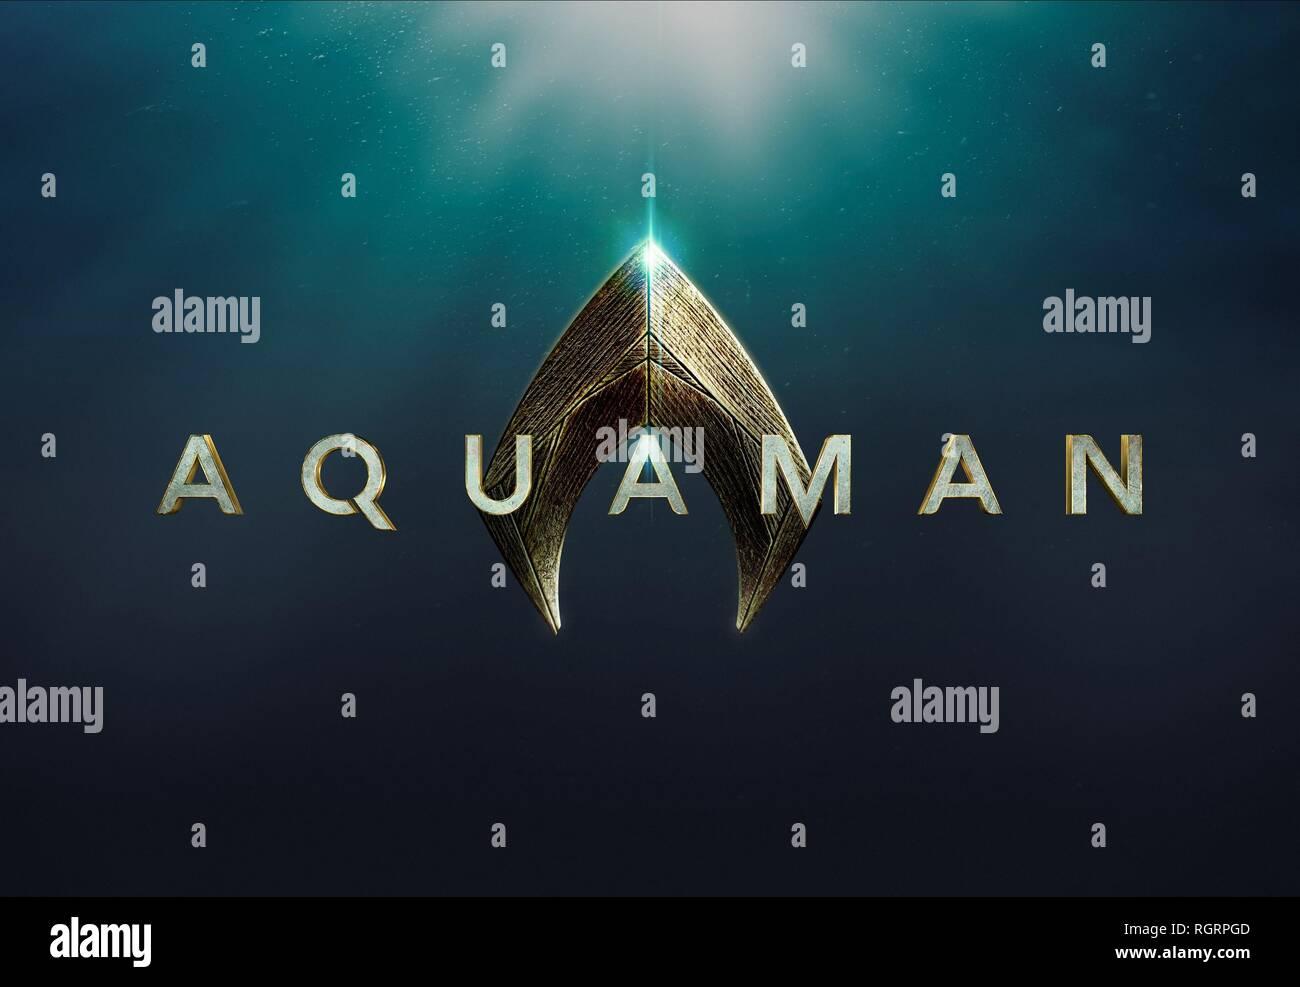 AQUAMAN, MOVIE POSTER, 2018 - Stock Image